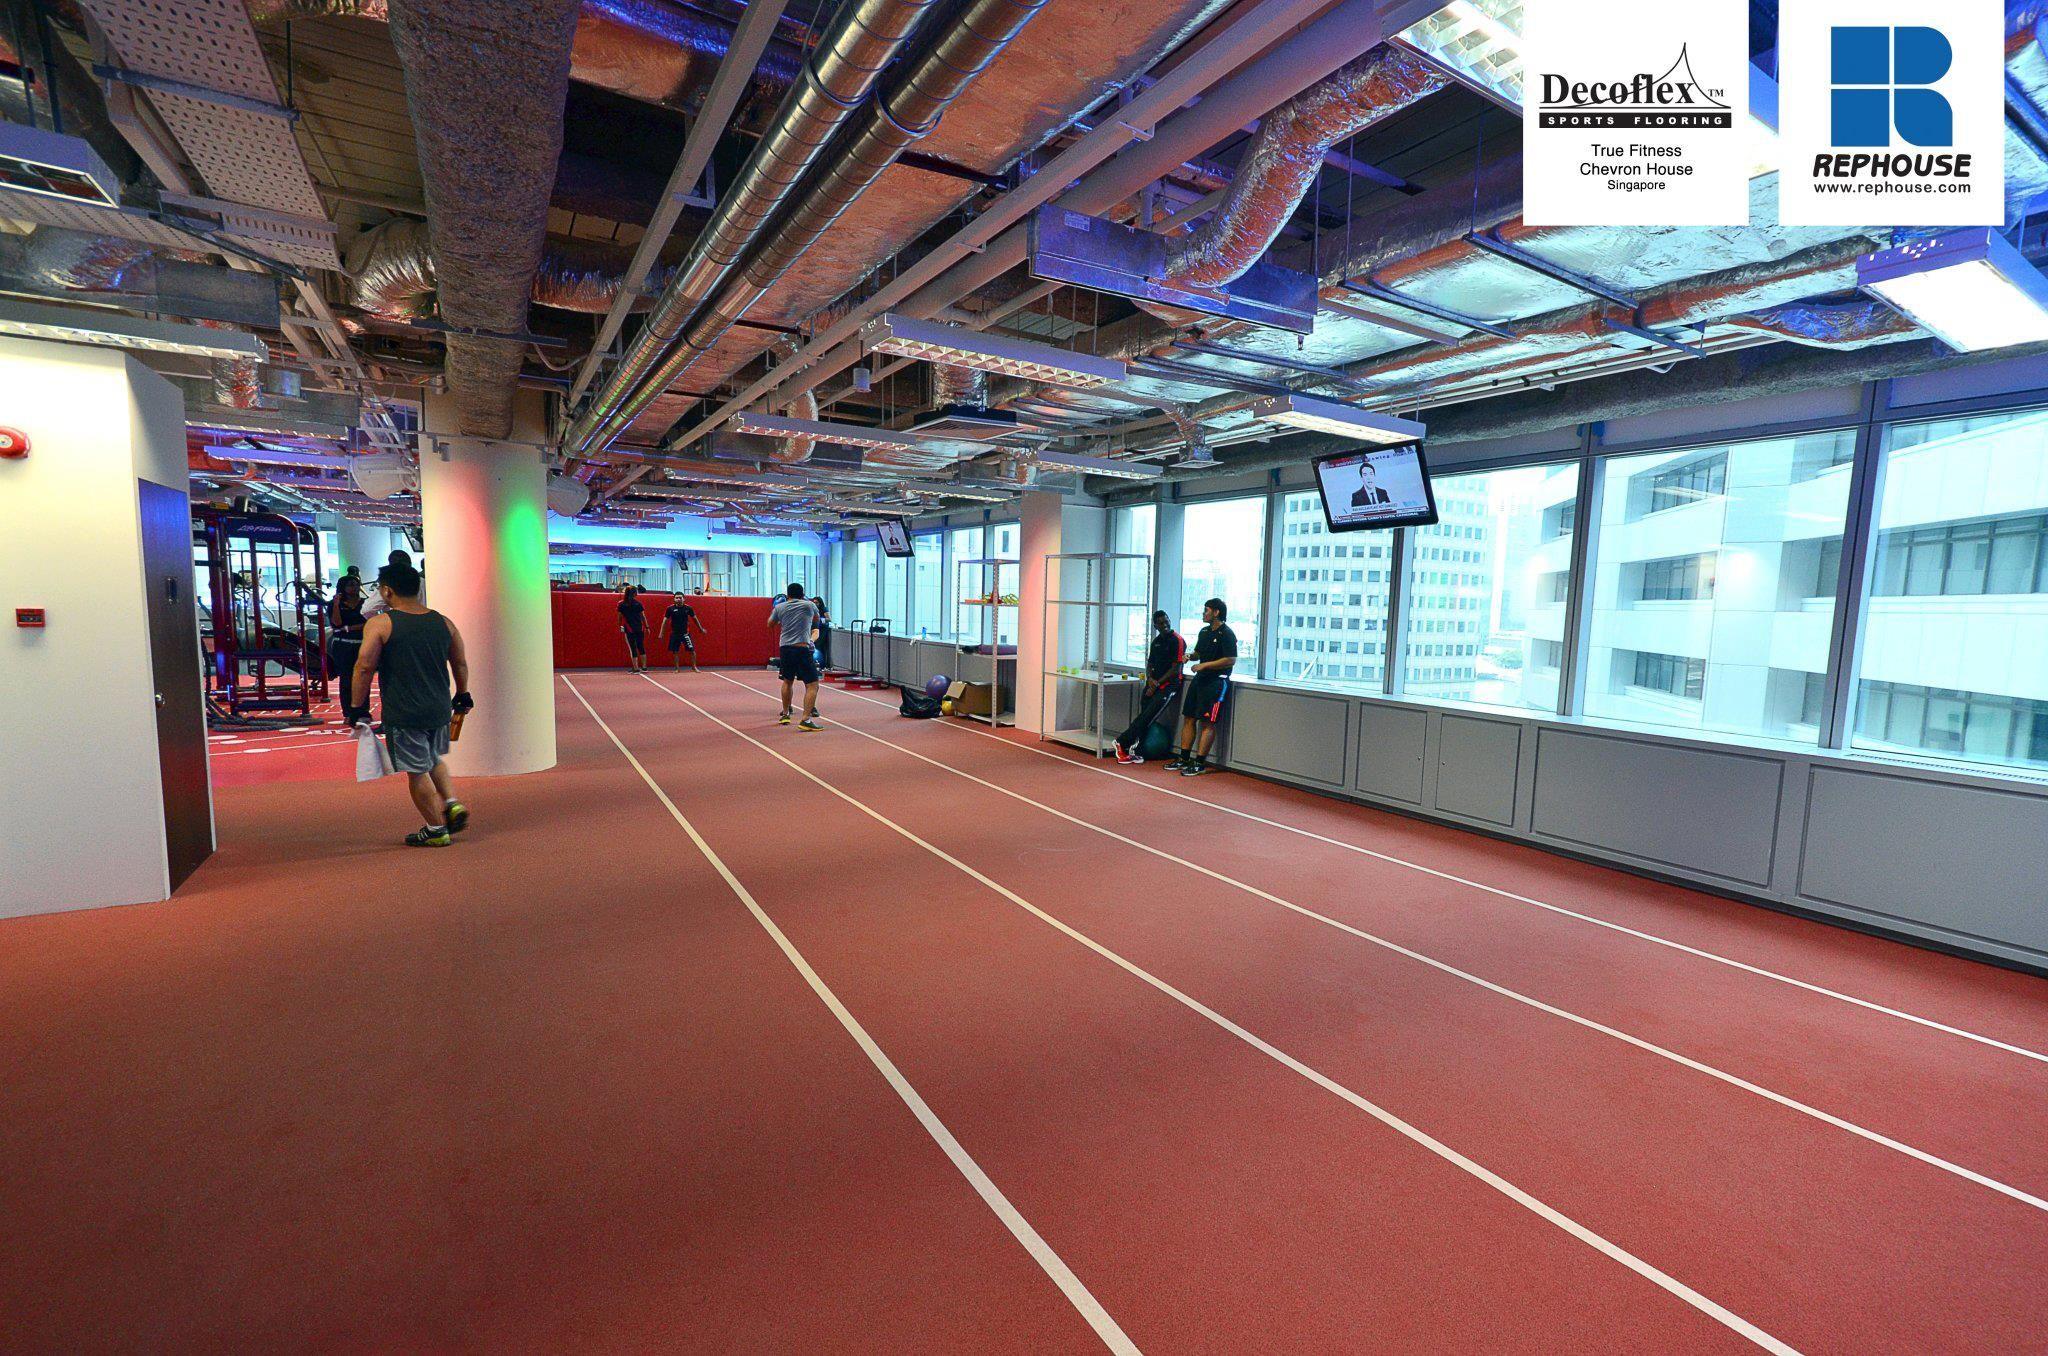 Decoflex Indoor Sprint Fitness Running Track True Fitness Chevron House Singapore Running Track Singapore Tennis Court